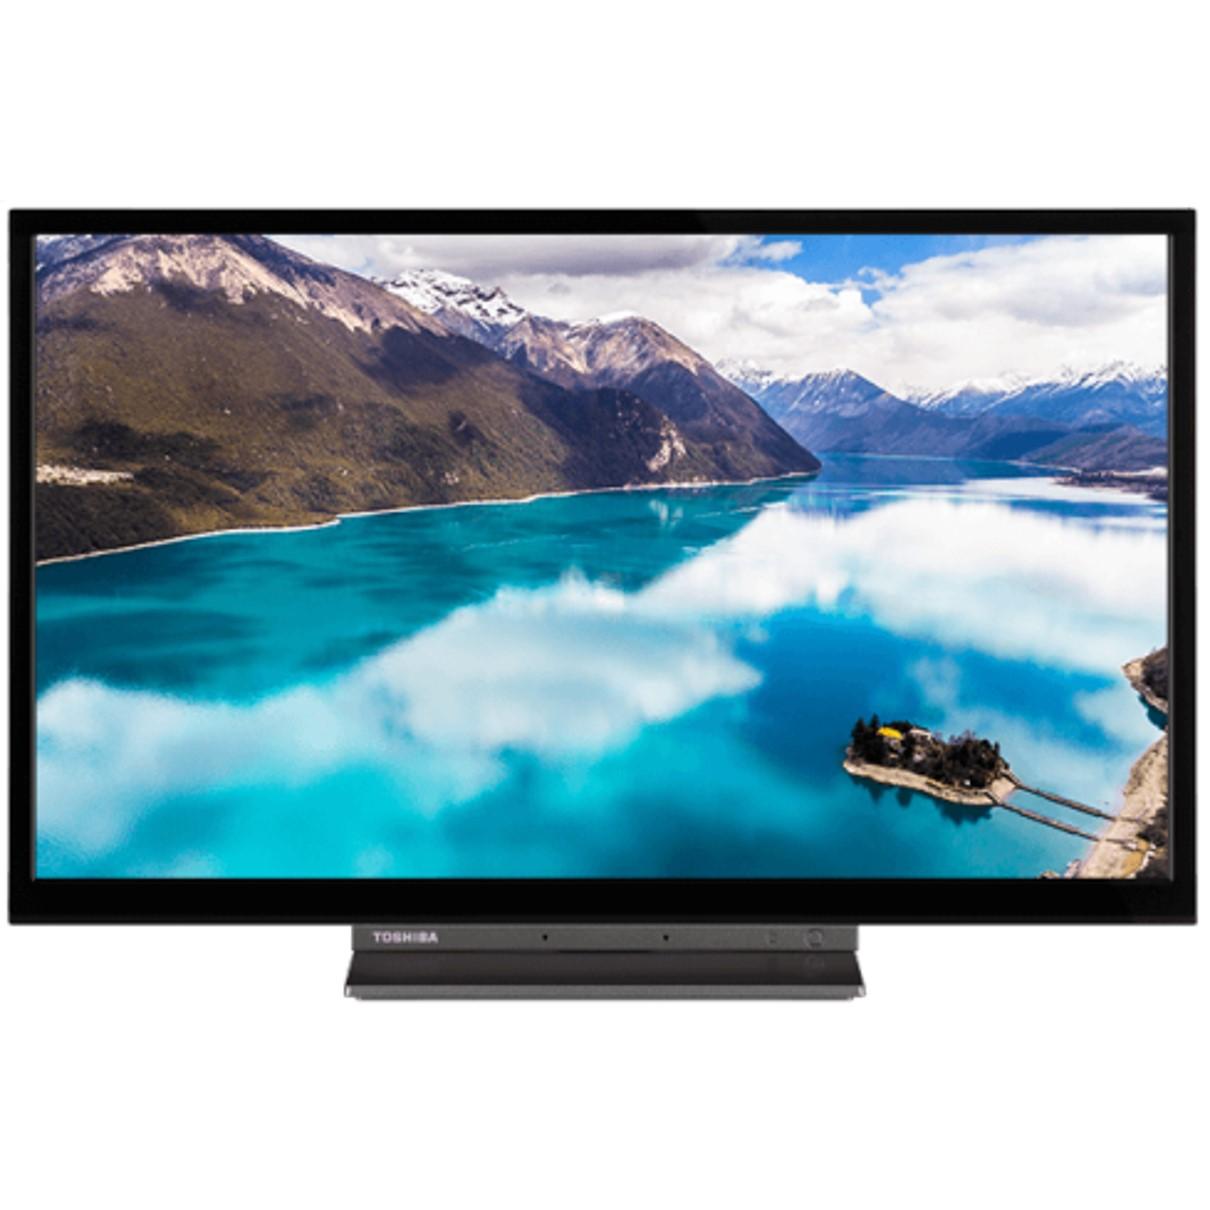 "TV TOSHIBA 32"" HD READY/ 32WK3A63DG/ SMART TV/ ALEXA/ HDMI/ USB/ DVB-T2/C/S2/ A+"